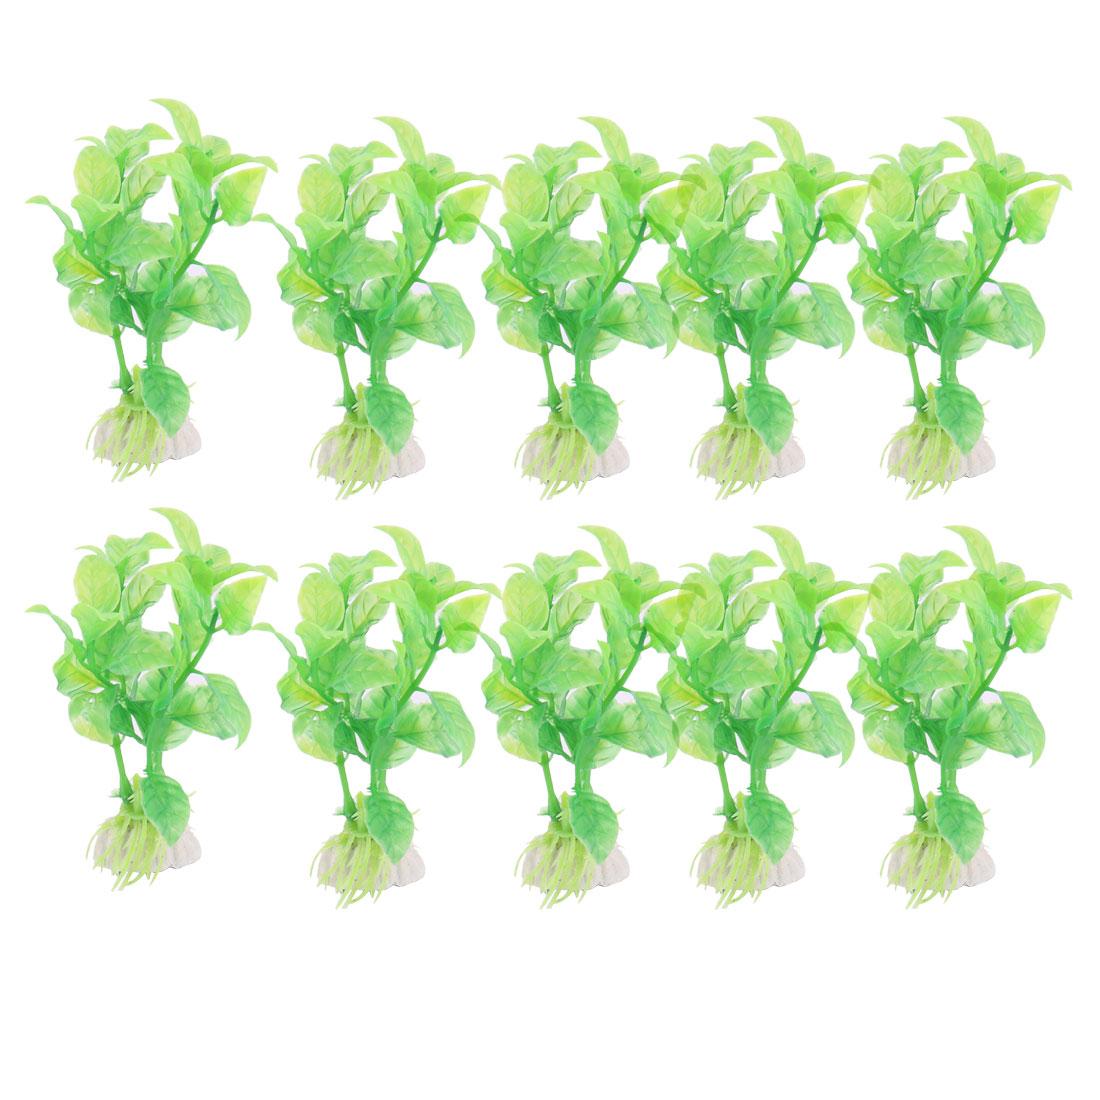 10 PCS Green Plastic Grass Aquarium Plants Fish Tank Decoration